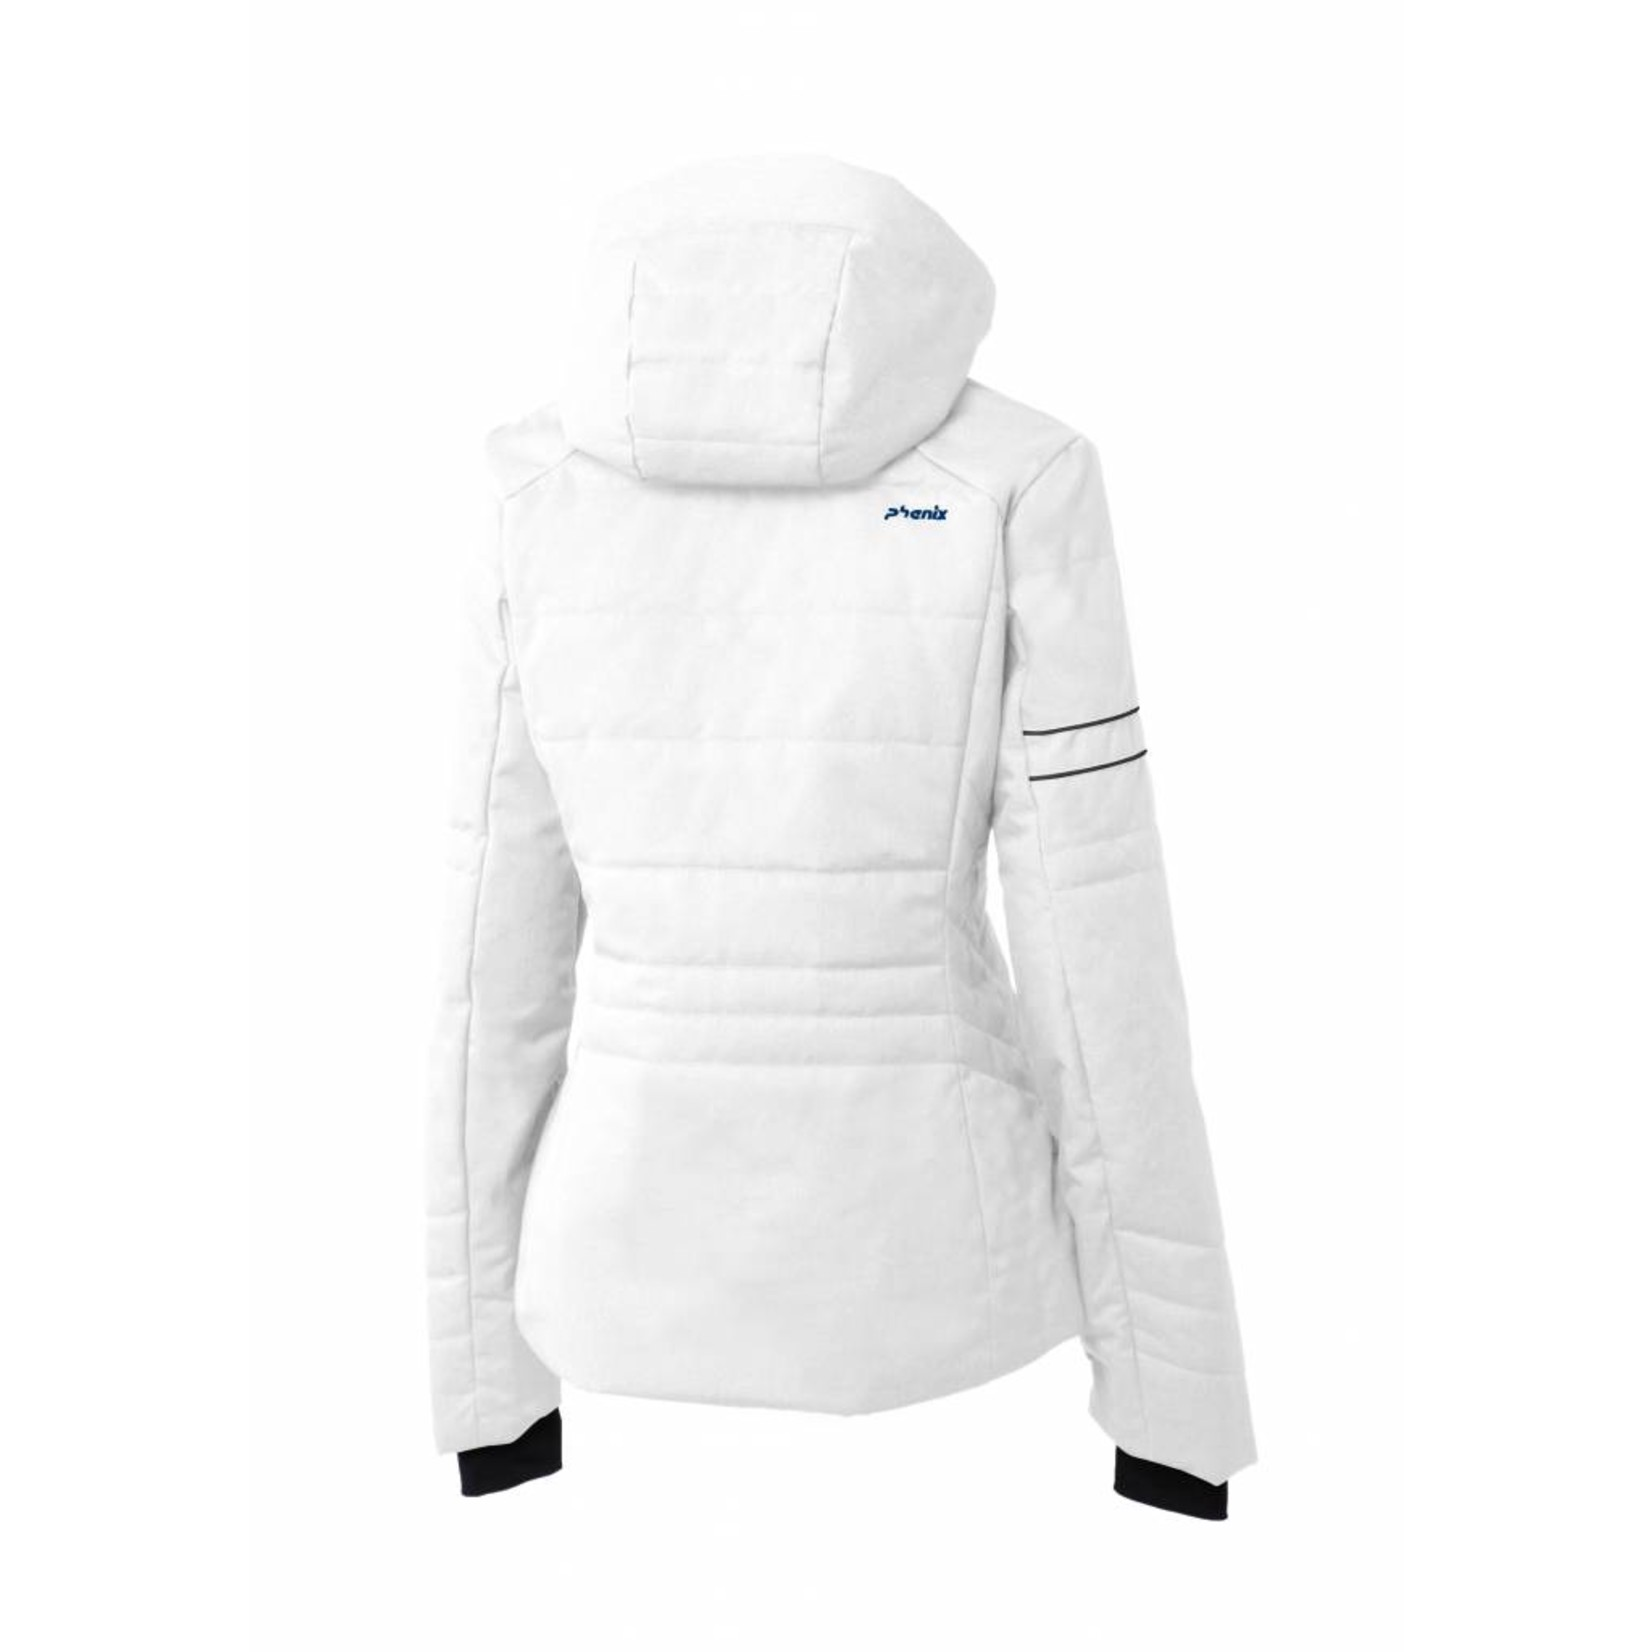 PHENIX Powder Snow Jacket